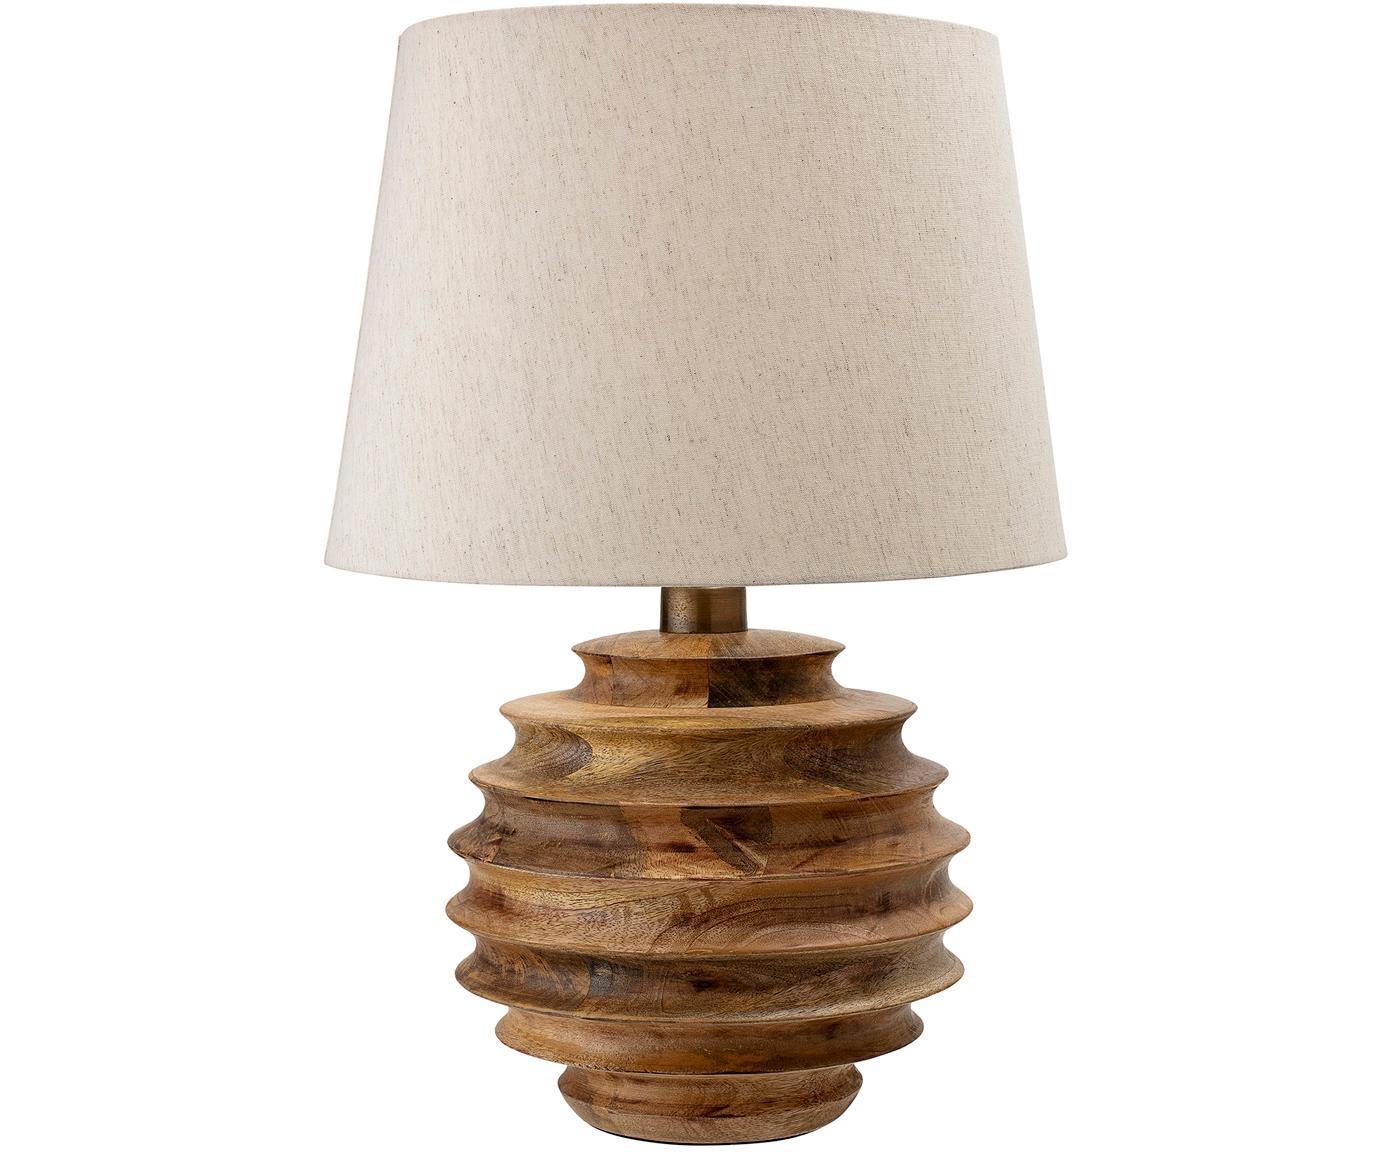 Tischleuchte Forsythia aus Mangoholz, Lampenfuß: Mangoholz, Lampenschirm: Baumwolle, Weiß, Mangoholz, Ø 38 x H 54 cm